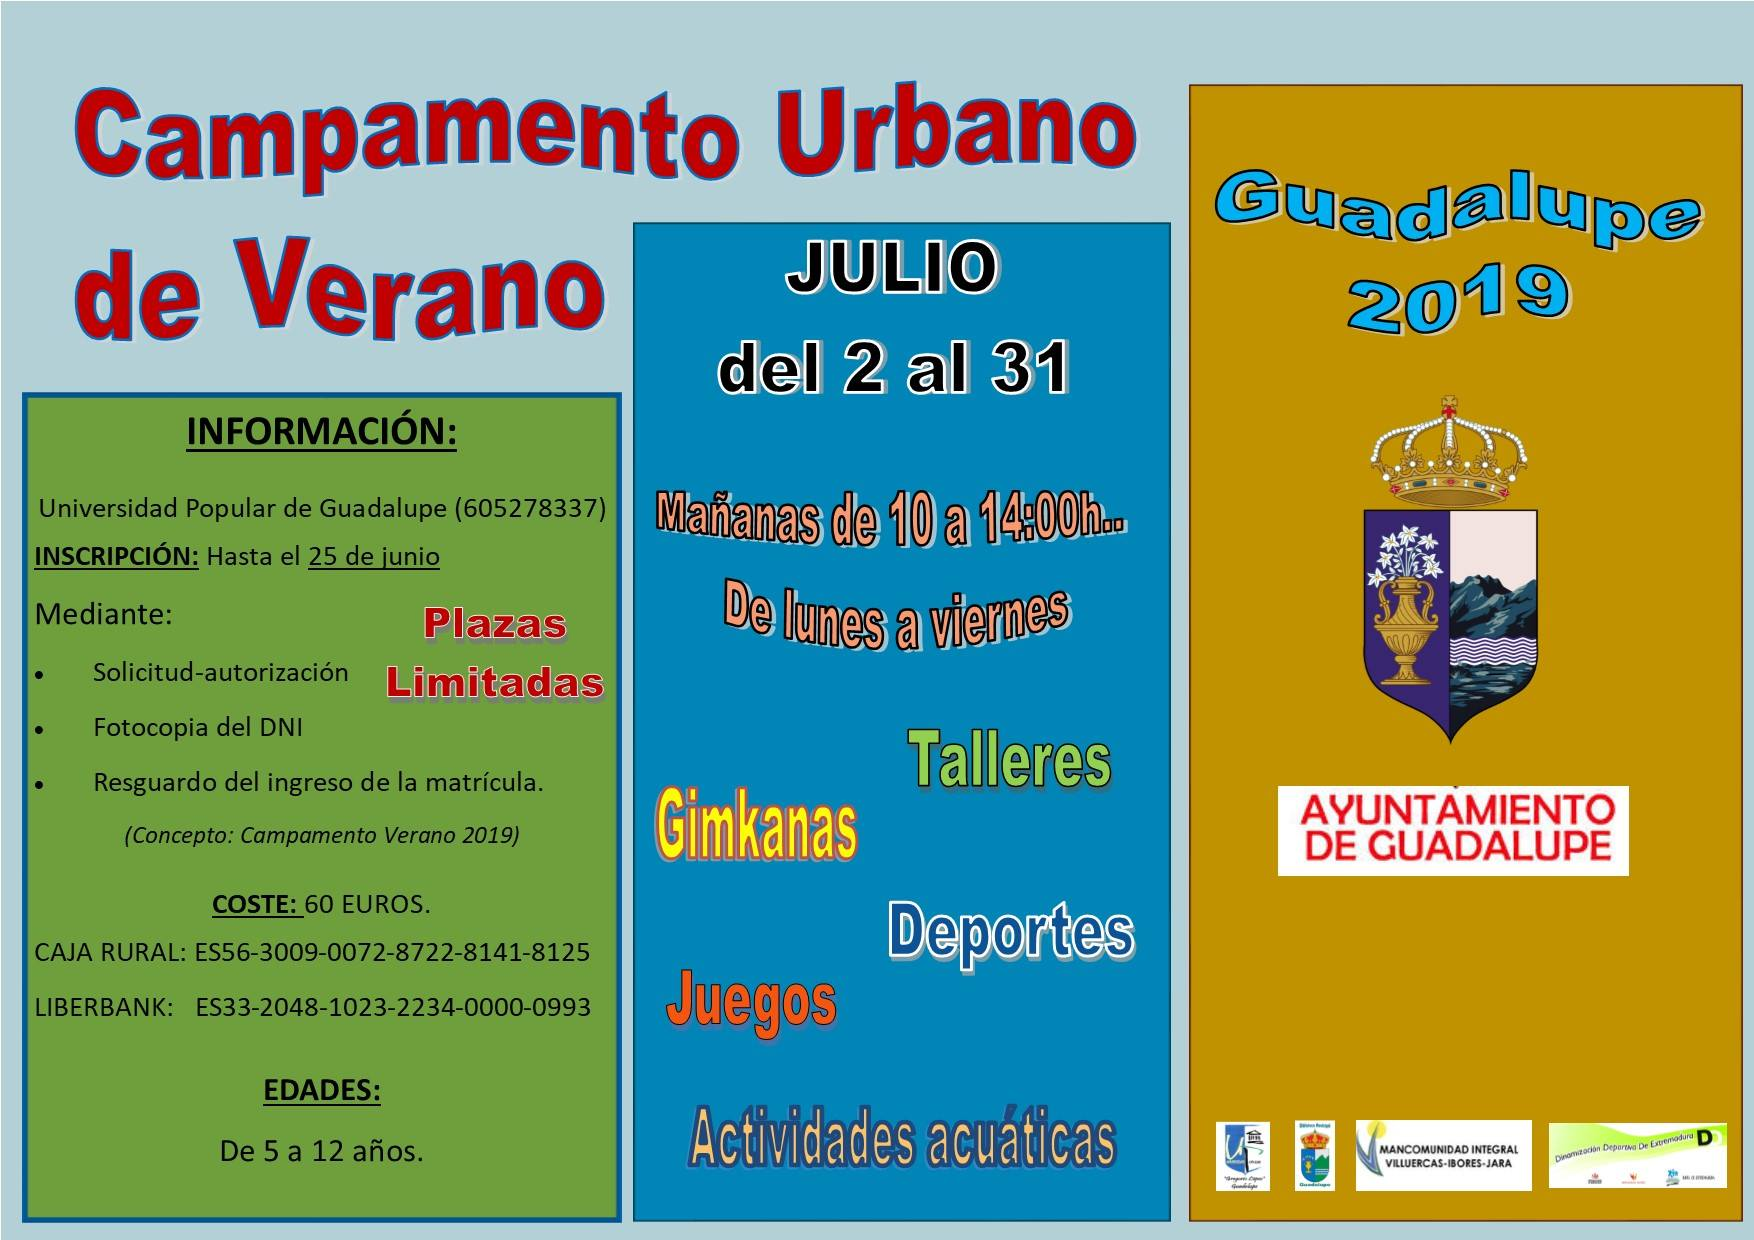 Campamento urbano de verano 2019 - Guadalupe (Cáceres)